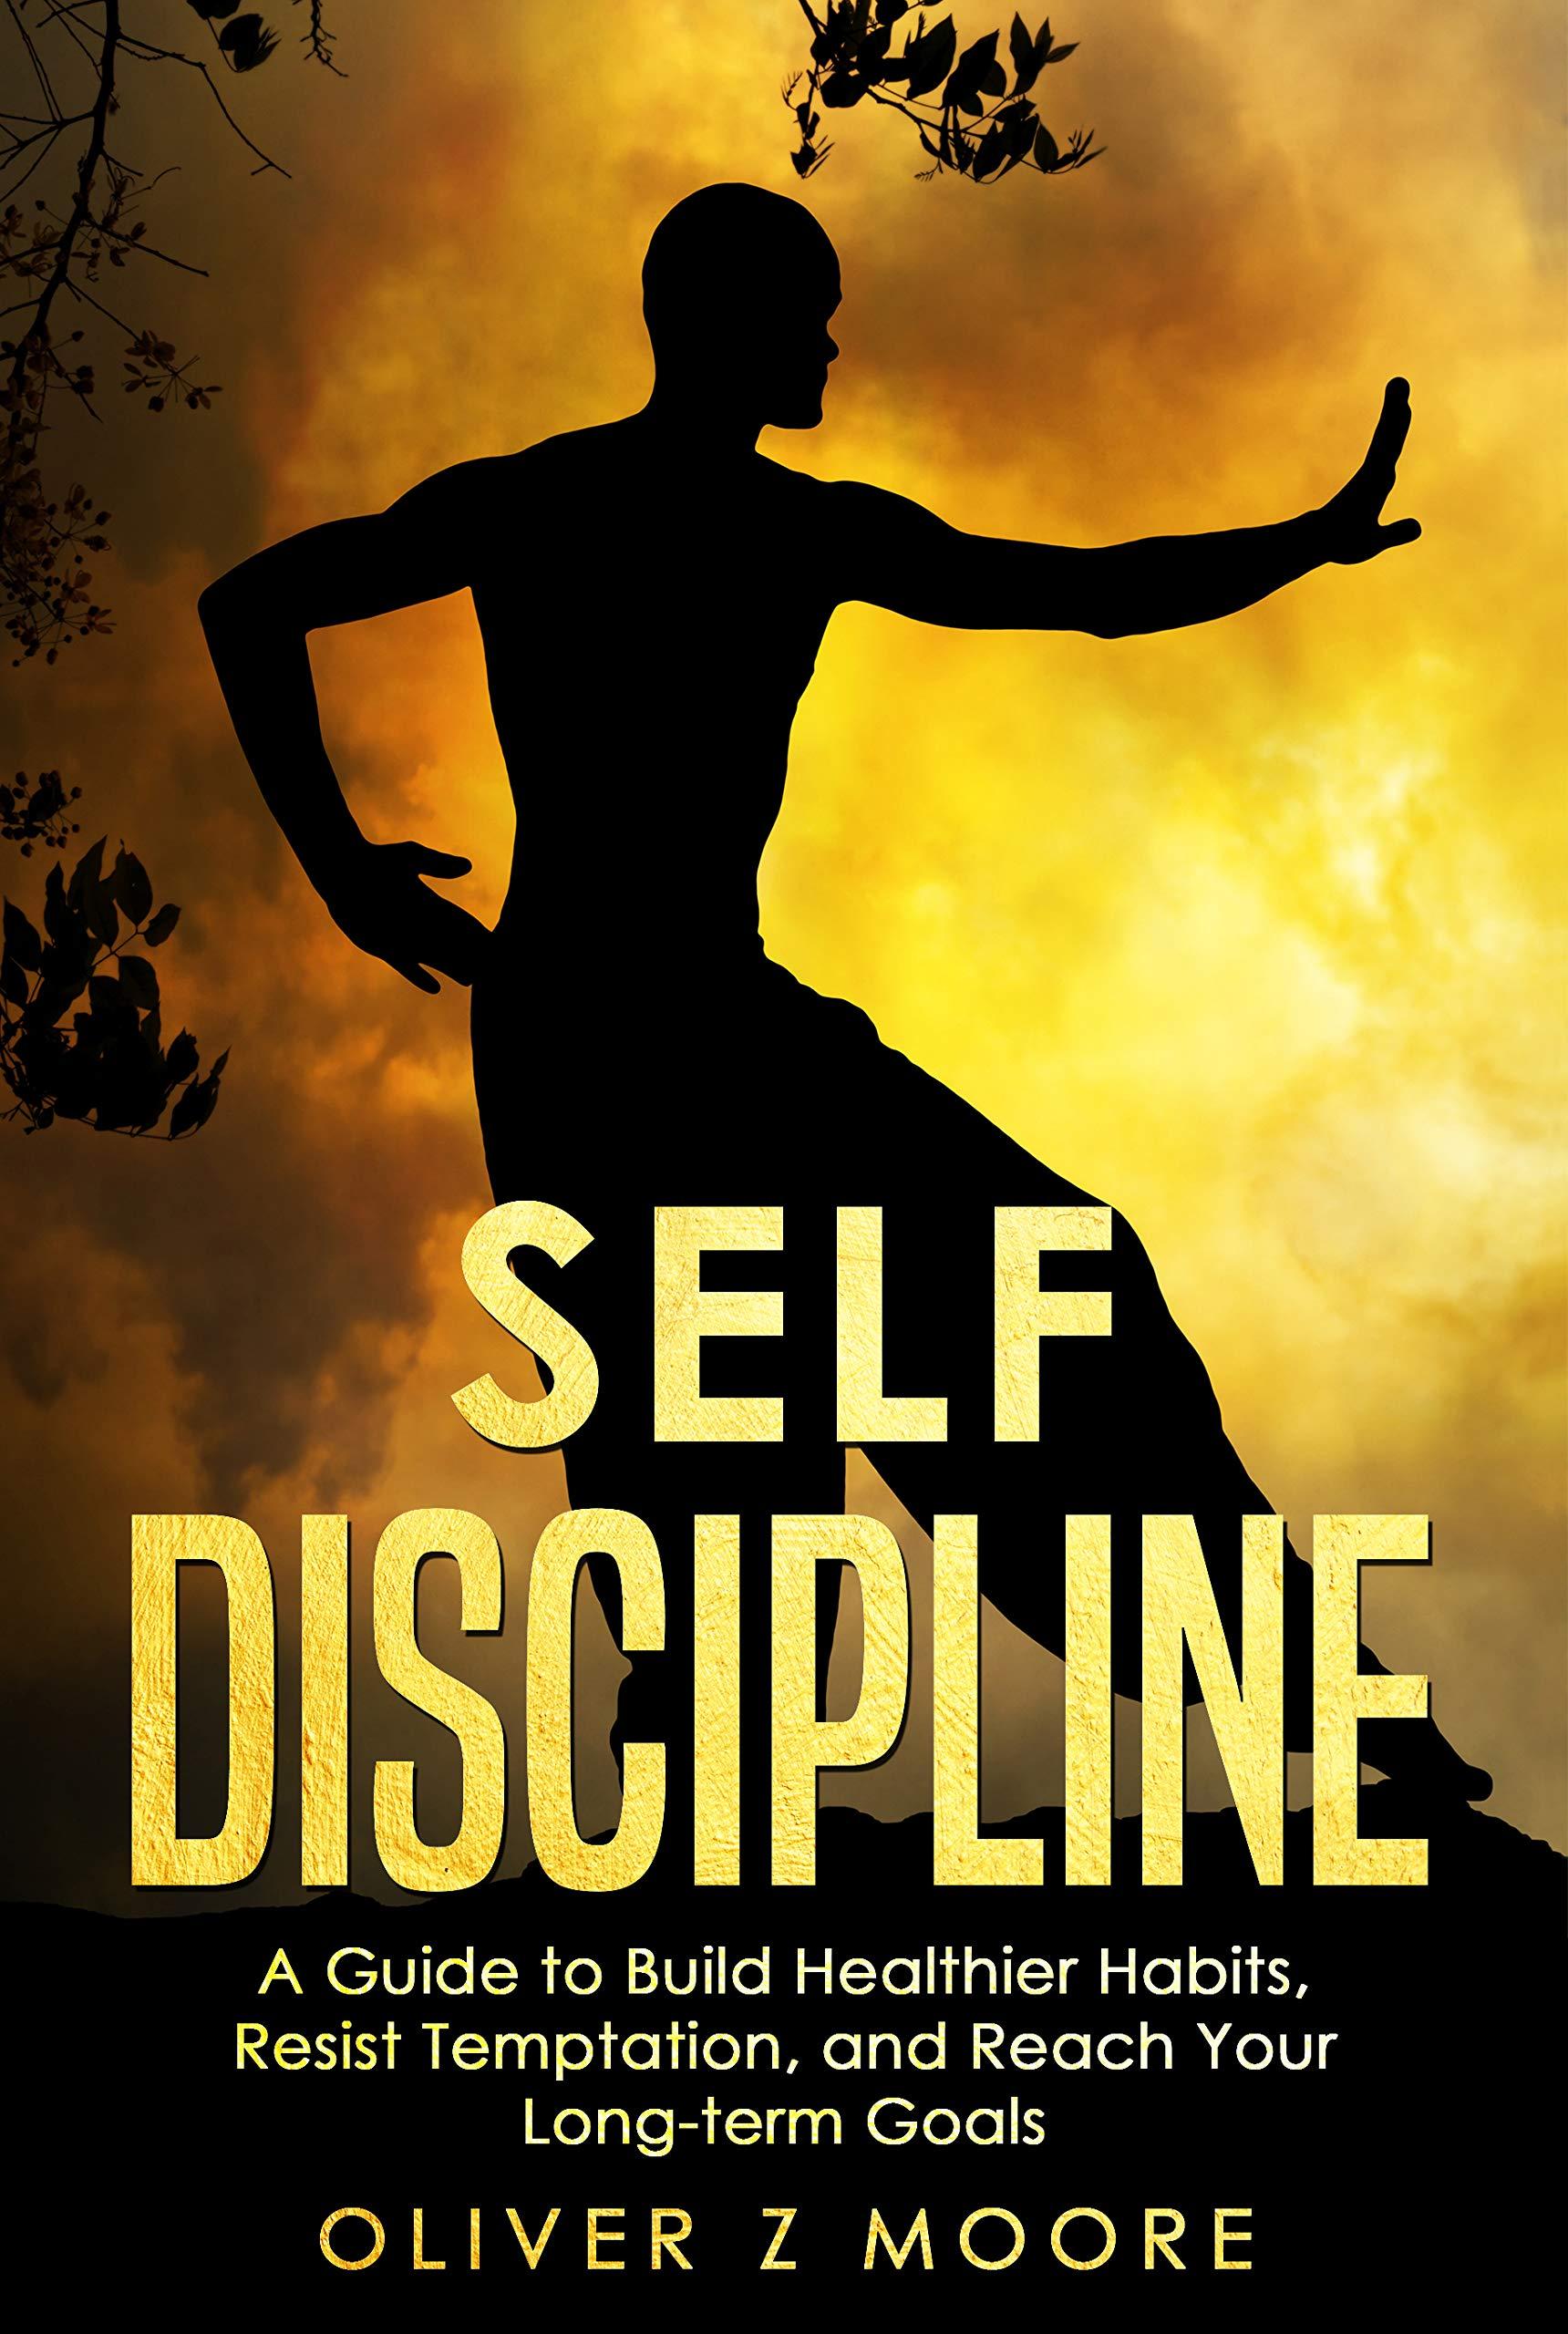 SELF DISCIPLINE : A Guide to Build Healthier Habits, Resist Temptation, and Reach Your Long-term Goals.